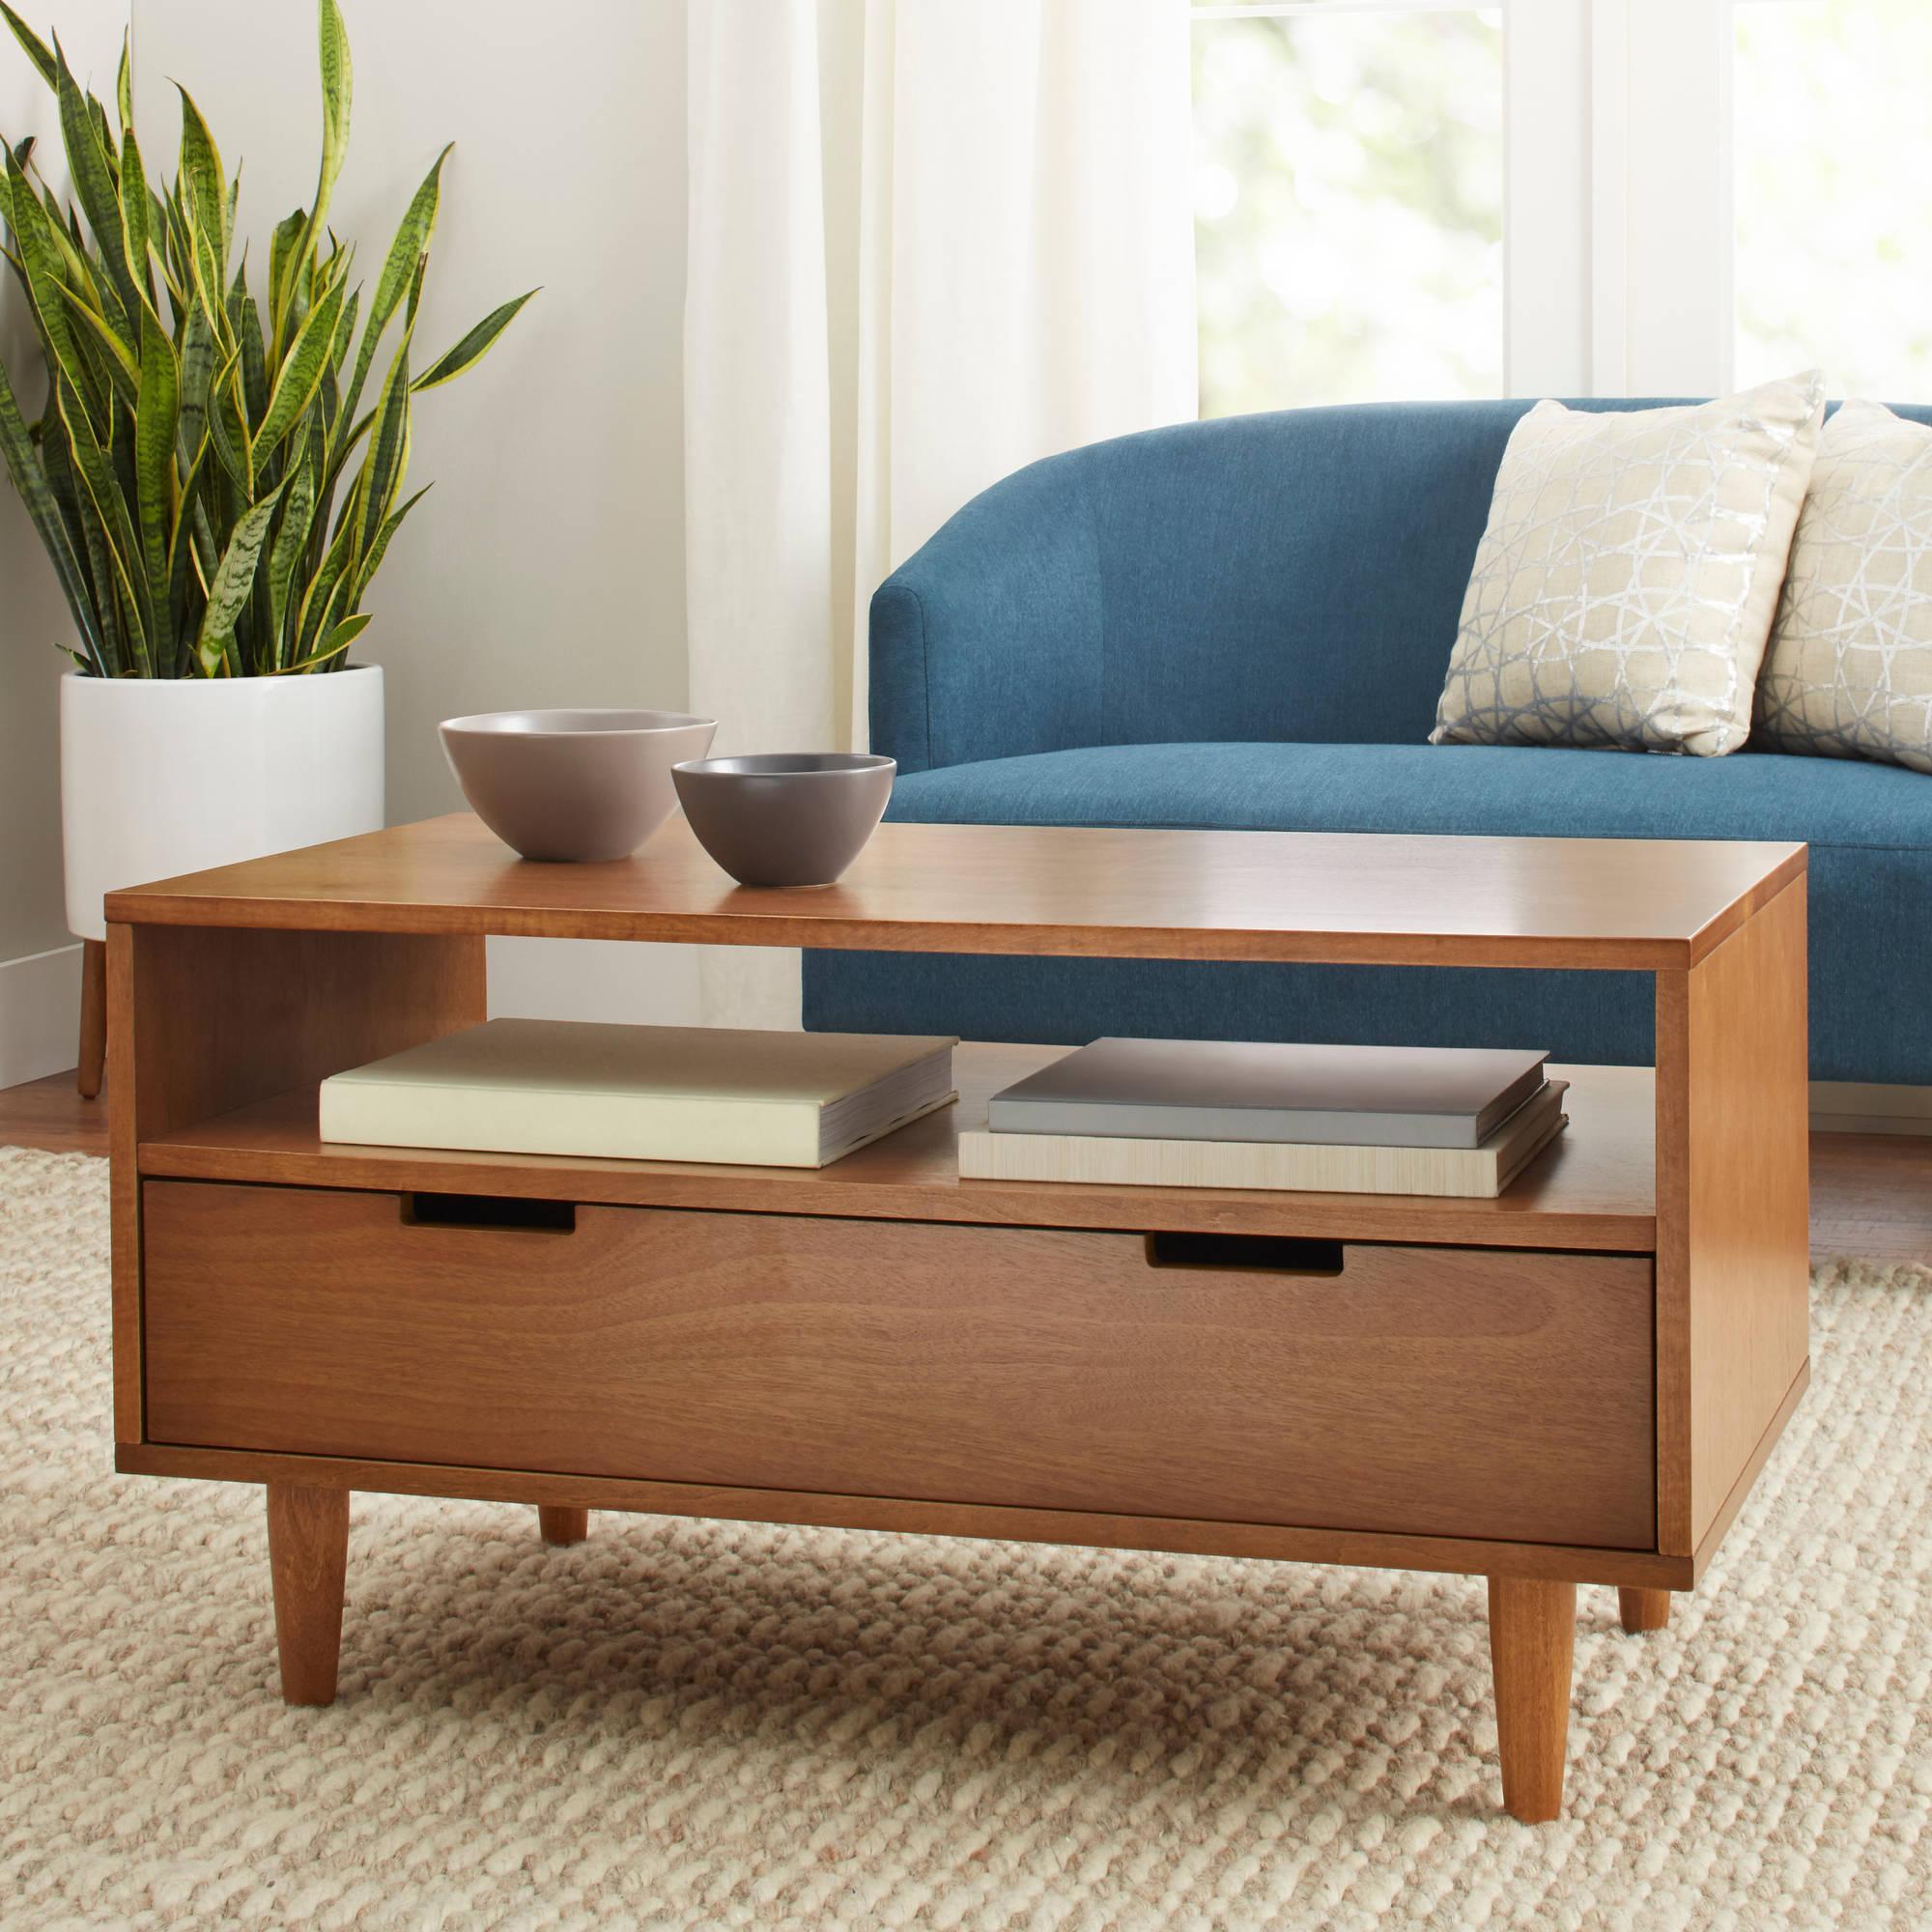 Popular Carson Carrington Astro Mid Century Coffee Tables Regarding Better Homes Gardens Flynn Mid Century Modern Coffee Table (View 16 of 20)